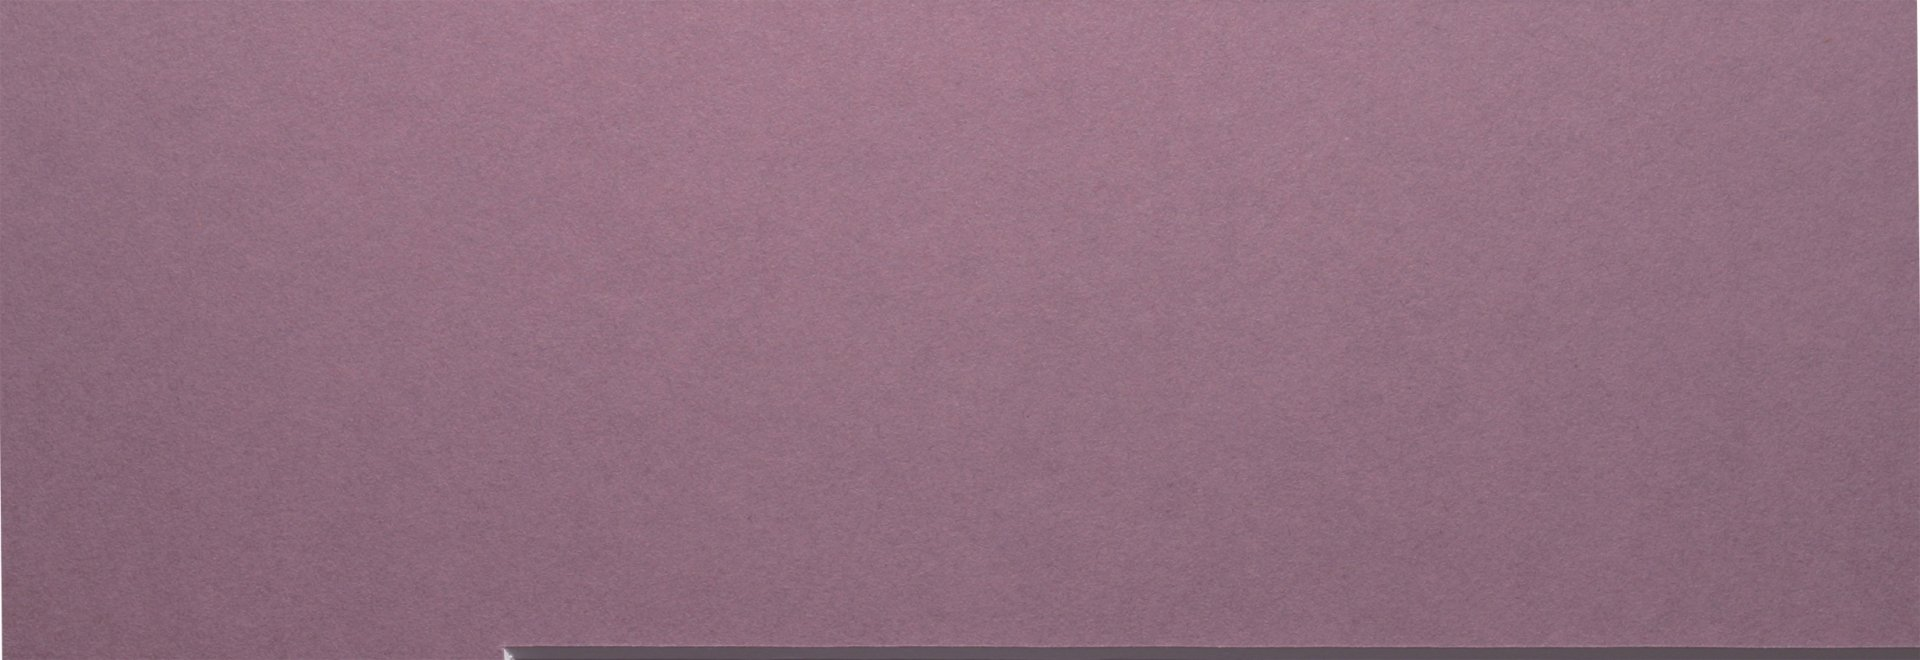 SRM1015 Grey Violet